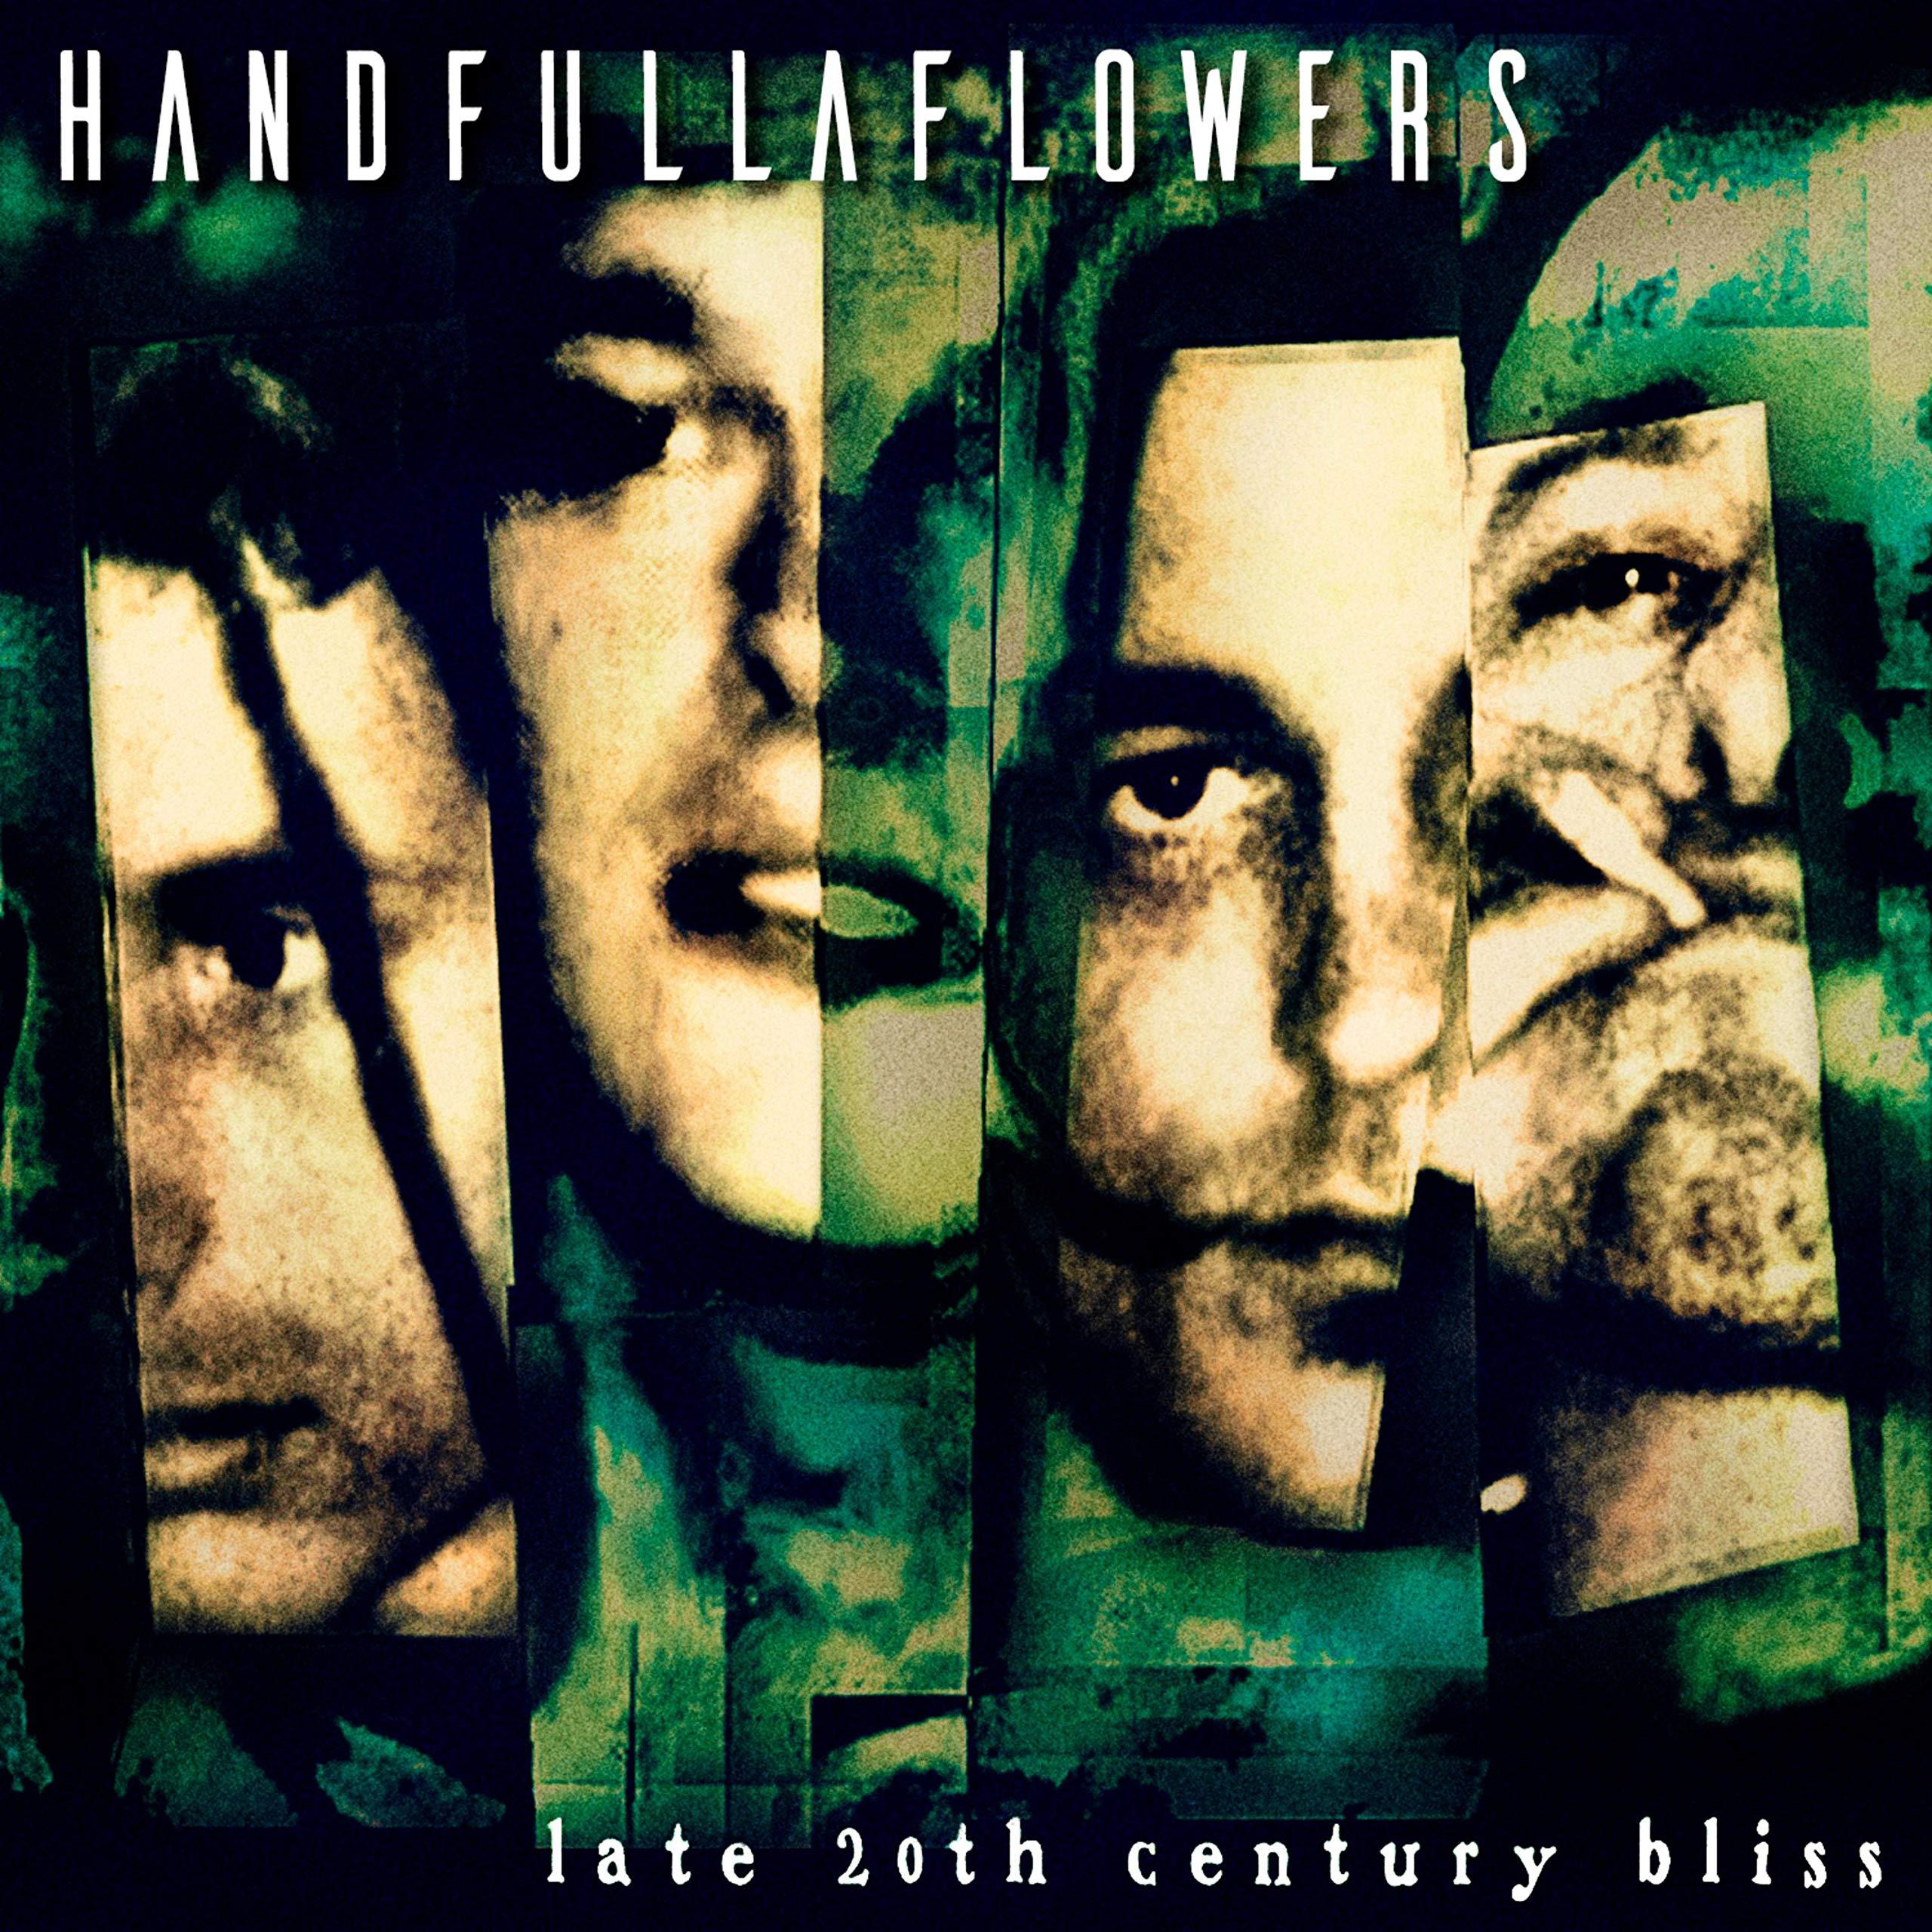 Handfullaflowers – Late 20th Century Bliss (1998) [FLAC]